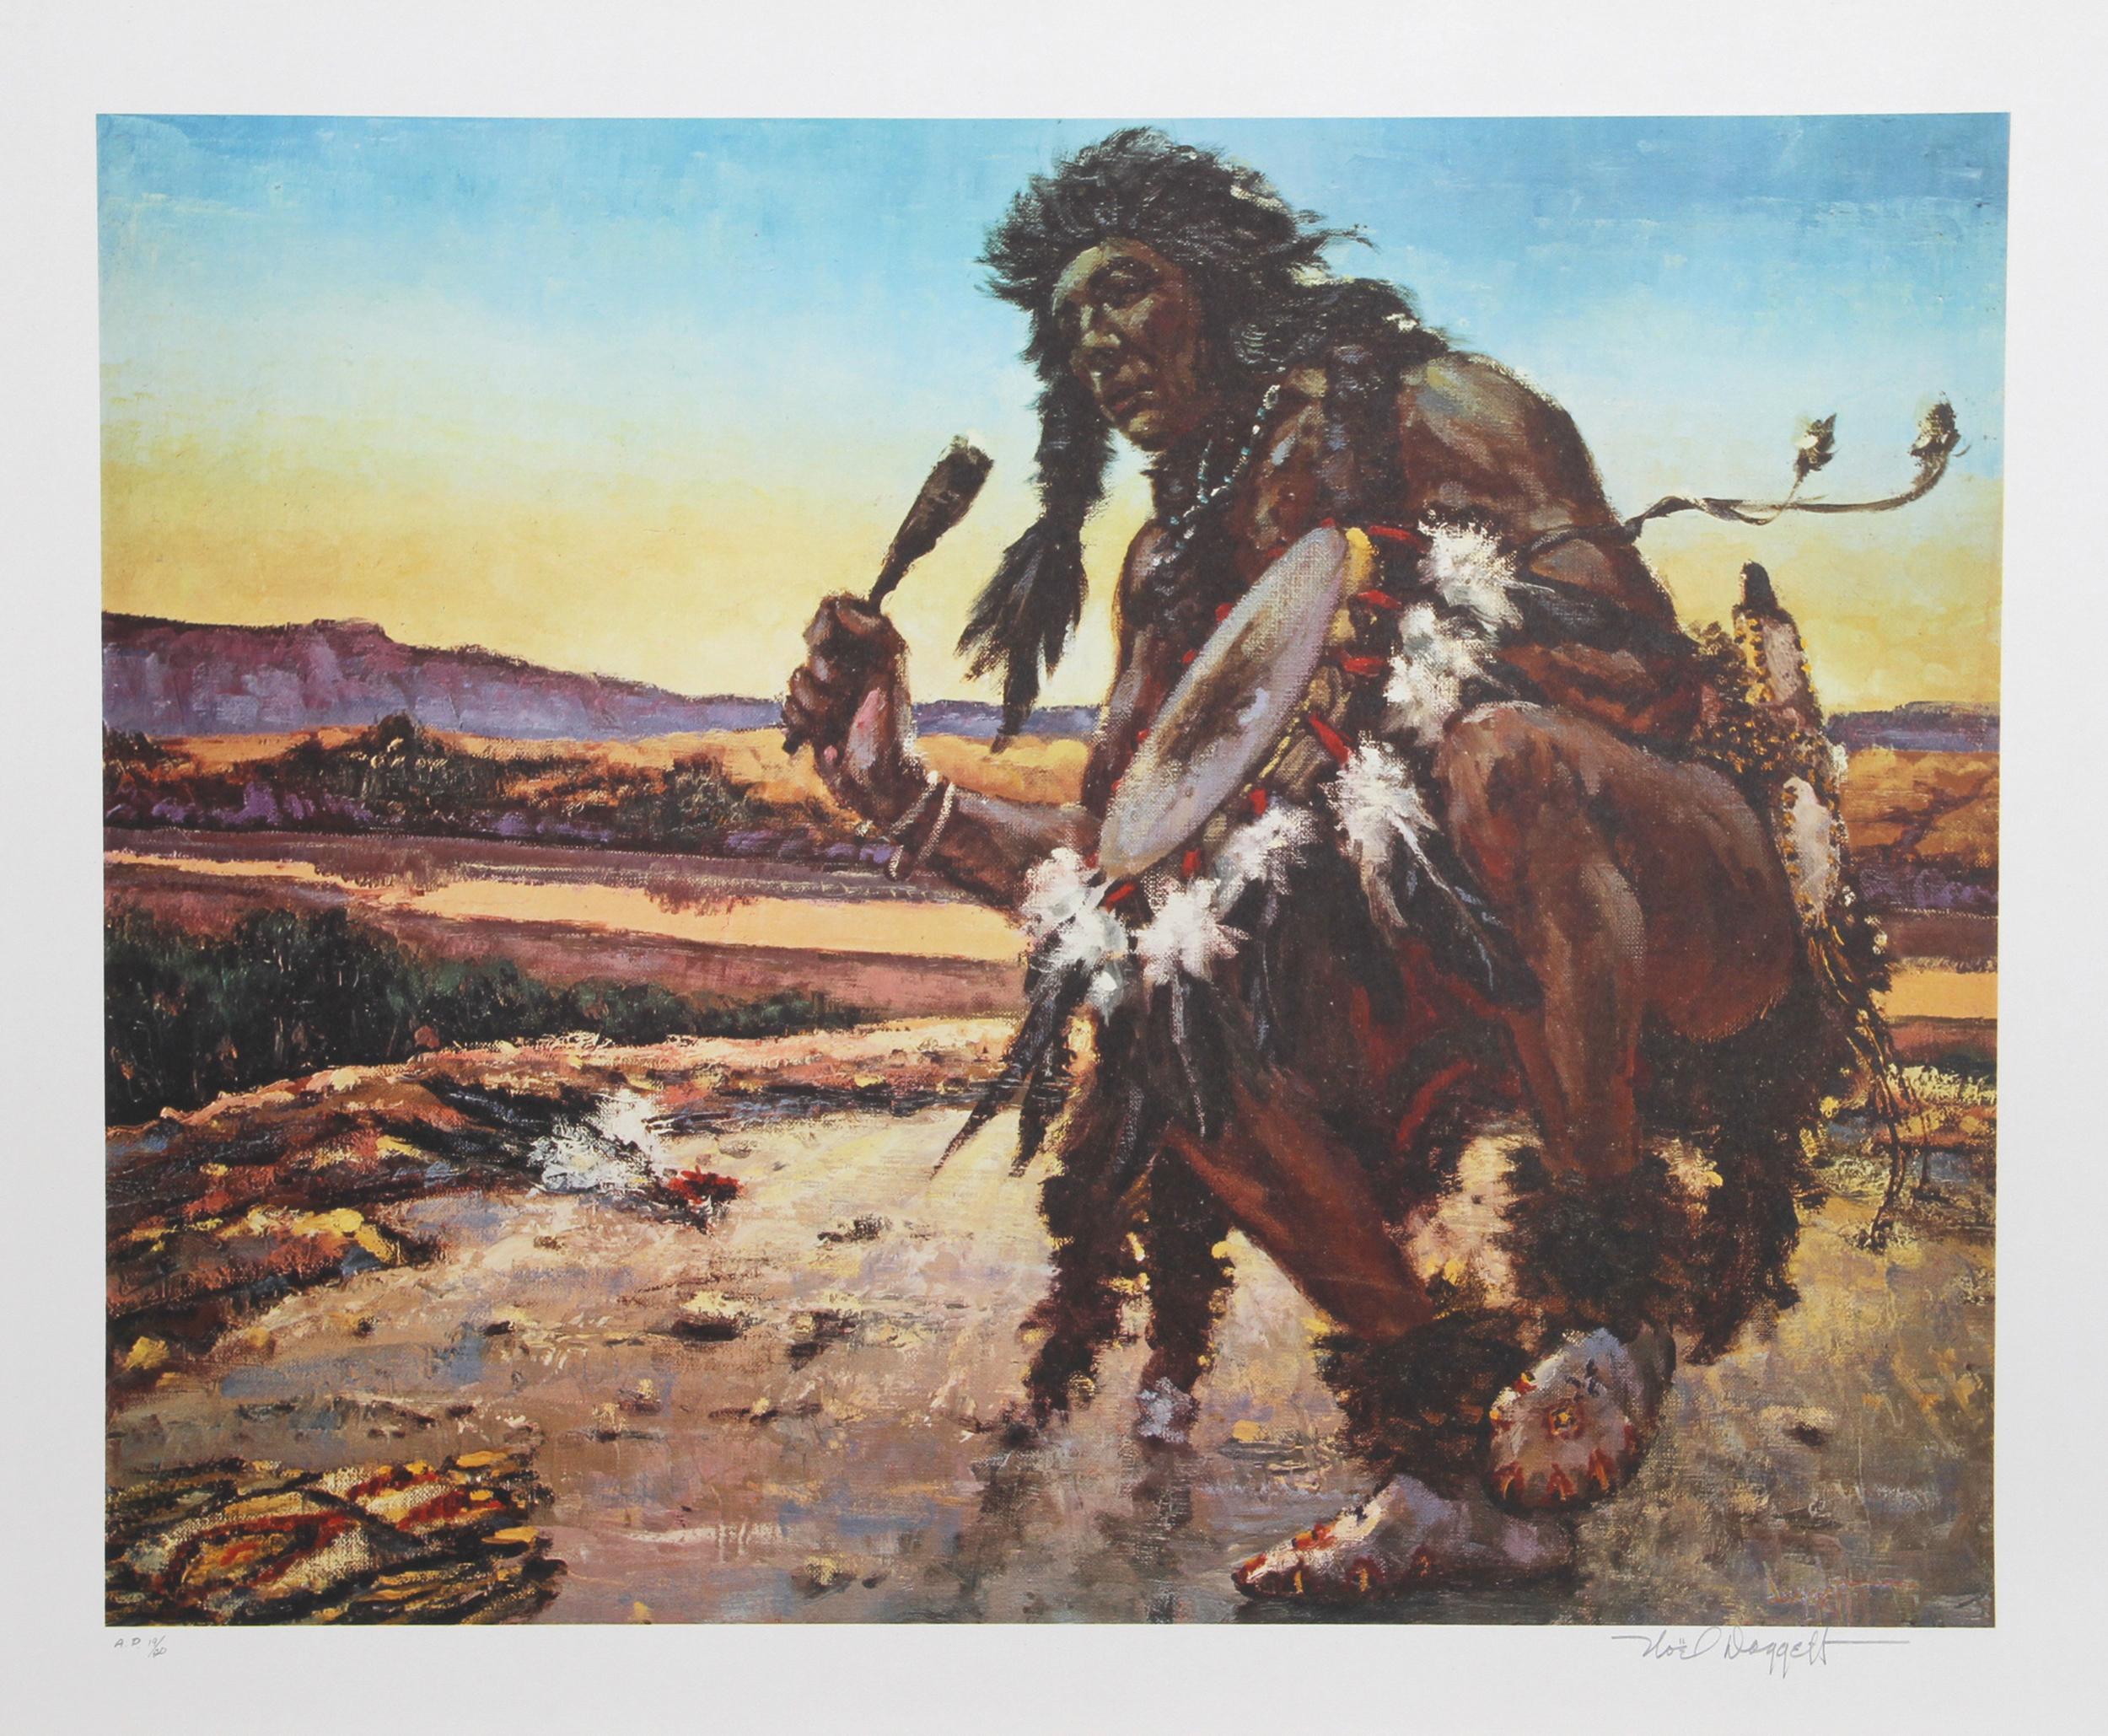 Noel Daggett, Bring Back the Buffalo, Lithograph